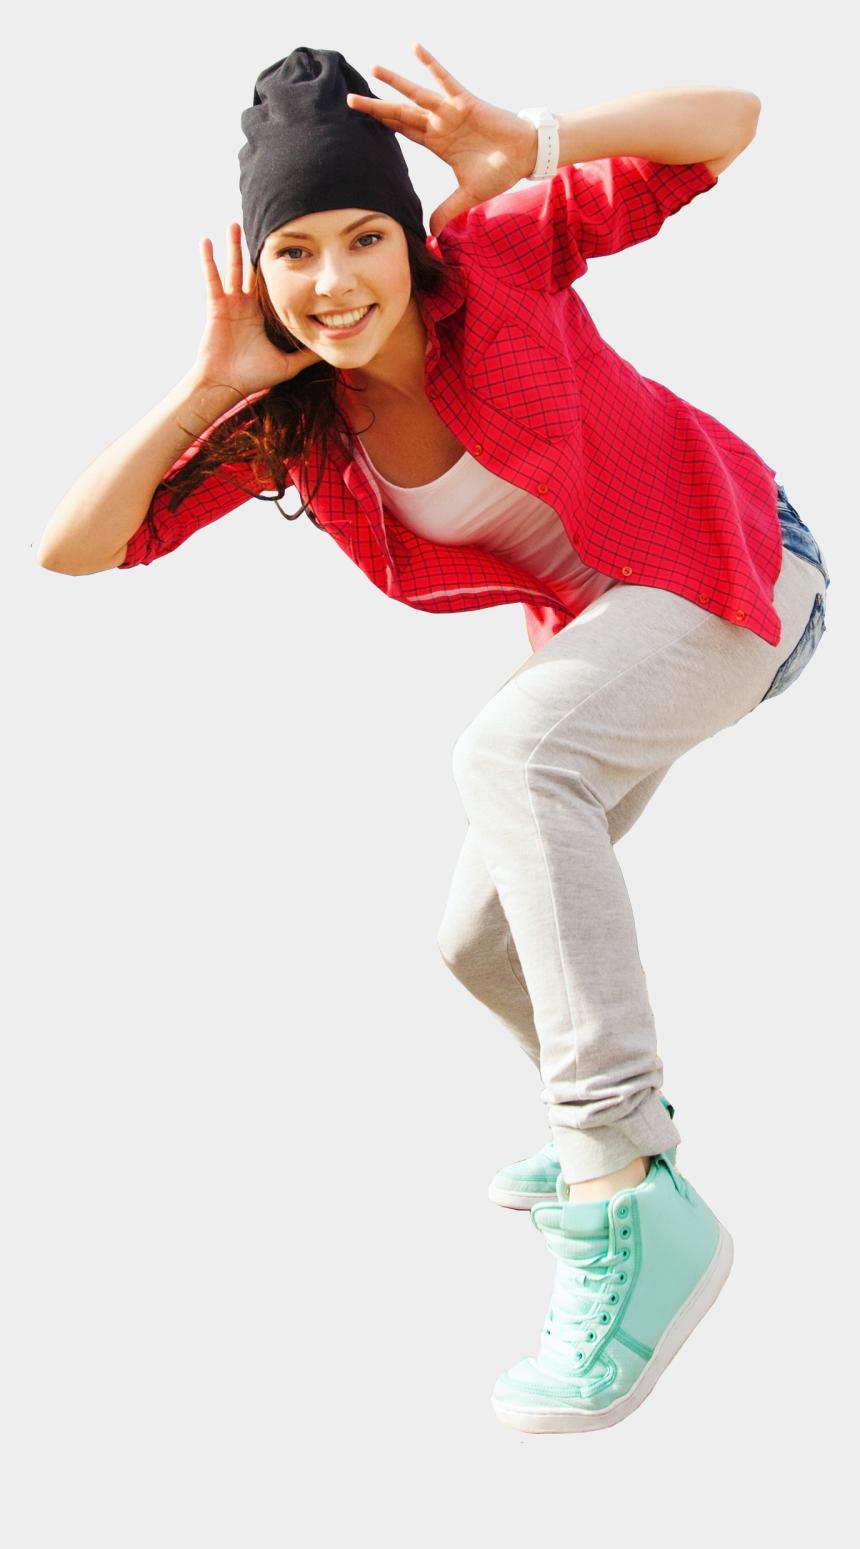 kids dance clipart, Cartoons - Kids Dancing Png - Hip Hop Dance Girl Png